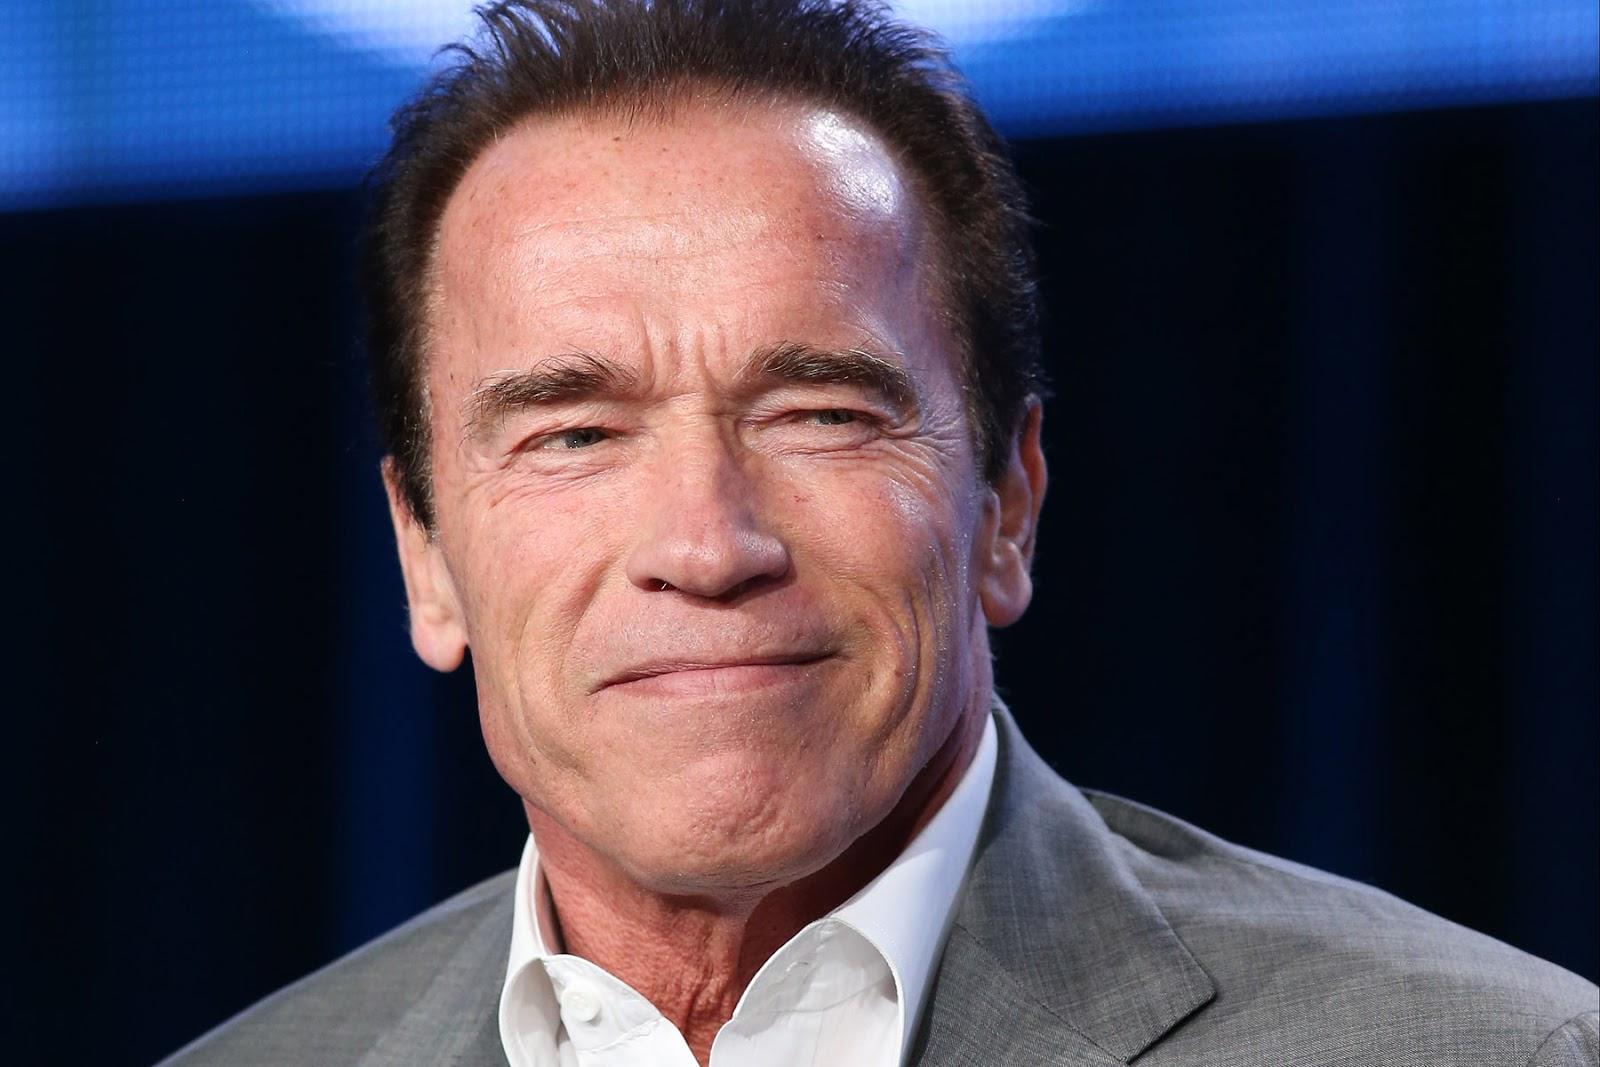 """Eu faria melhor do que o Obama como presidente"", diz Arnold Schwarzenegger"